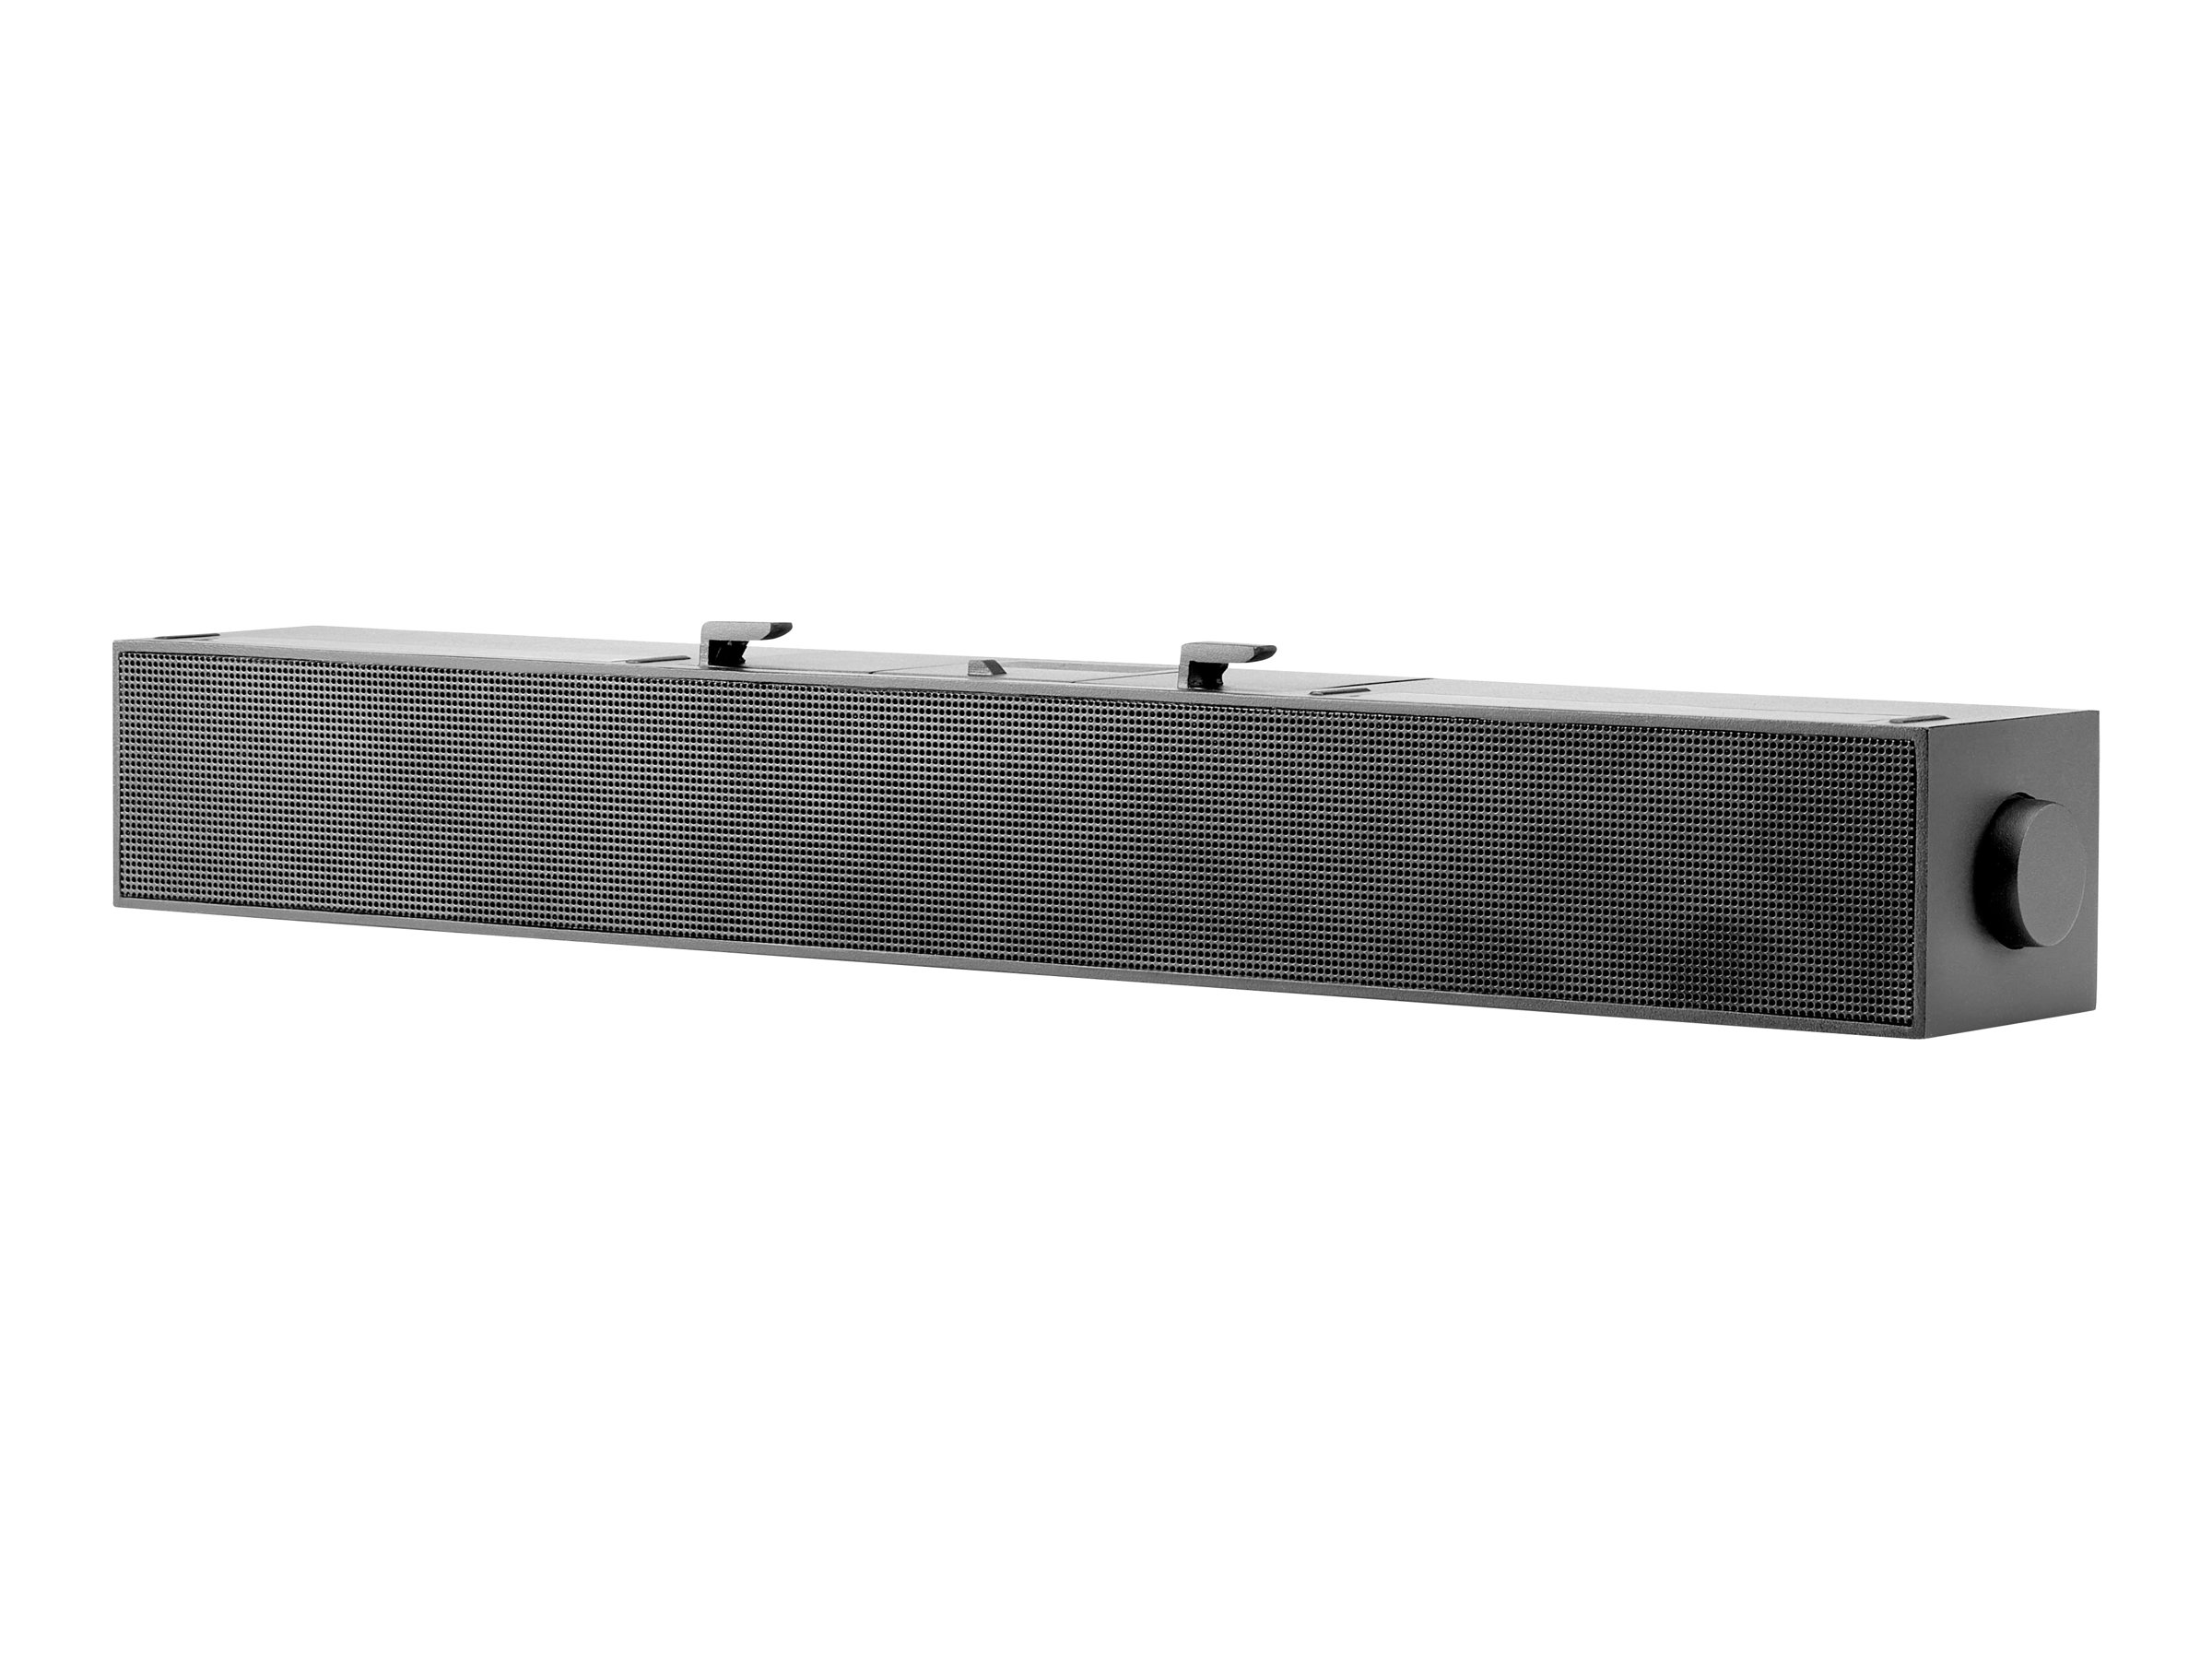 HP S100 - Soundleiste - for monitor - für HP Z22n G2, Z23n G2, Z24, Z24i G2, Z24n G2, Z24nf G2, Z27n G2; EliteDisplay E243, E273